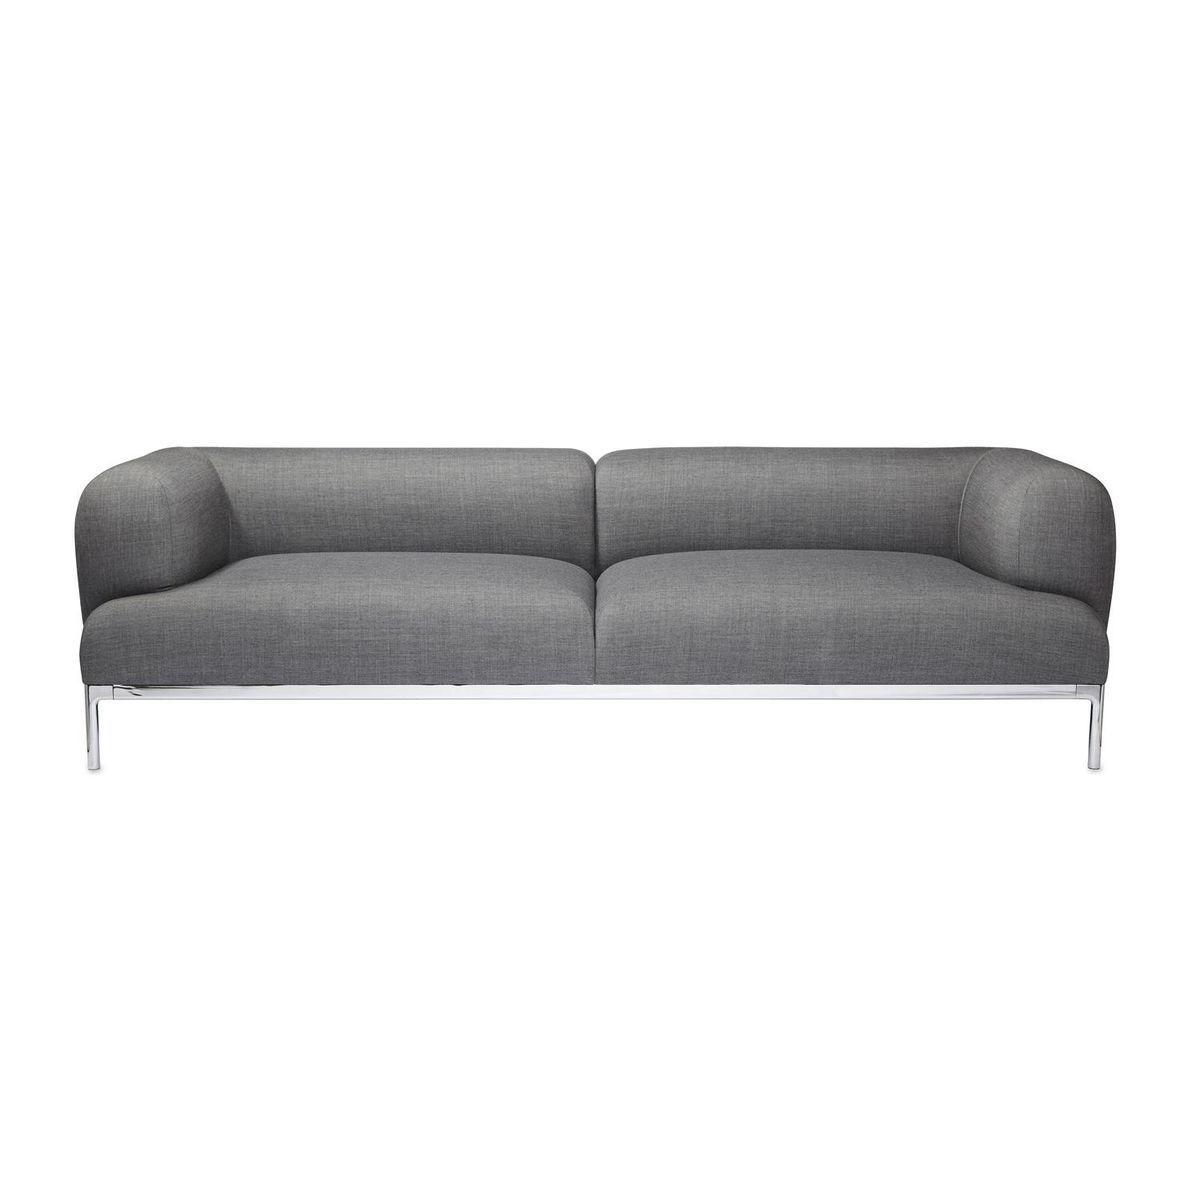 Bjørn 3 Sitzer Sofa | HAY | AmbienteDirect.com